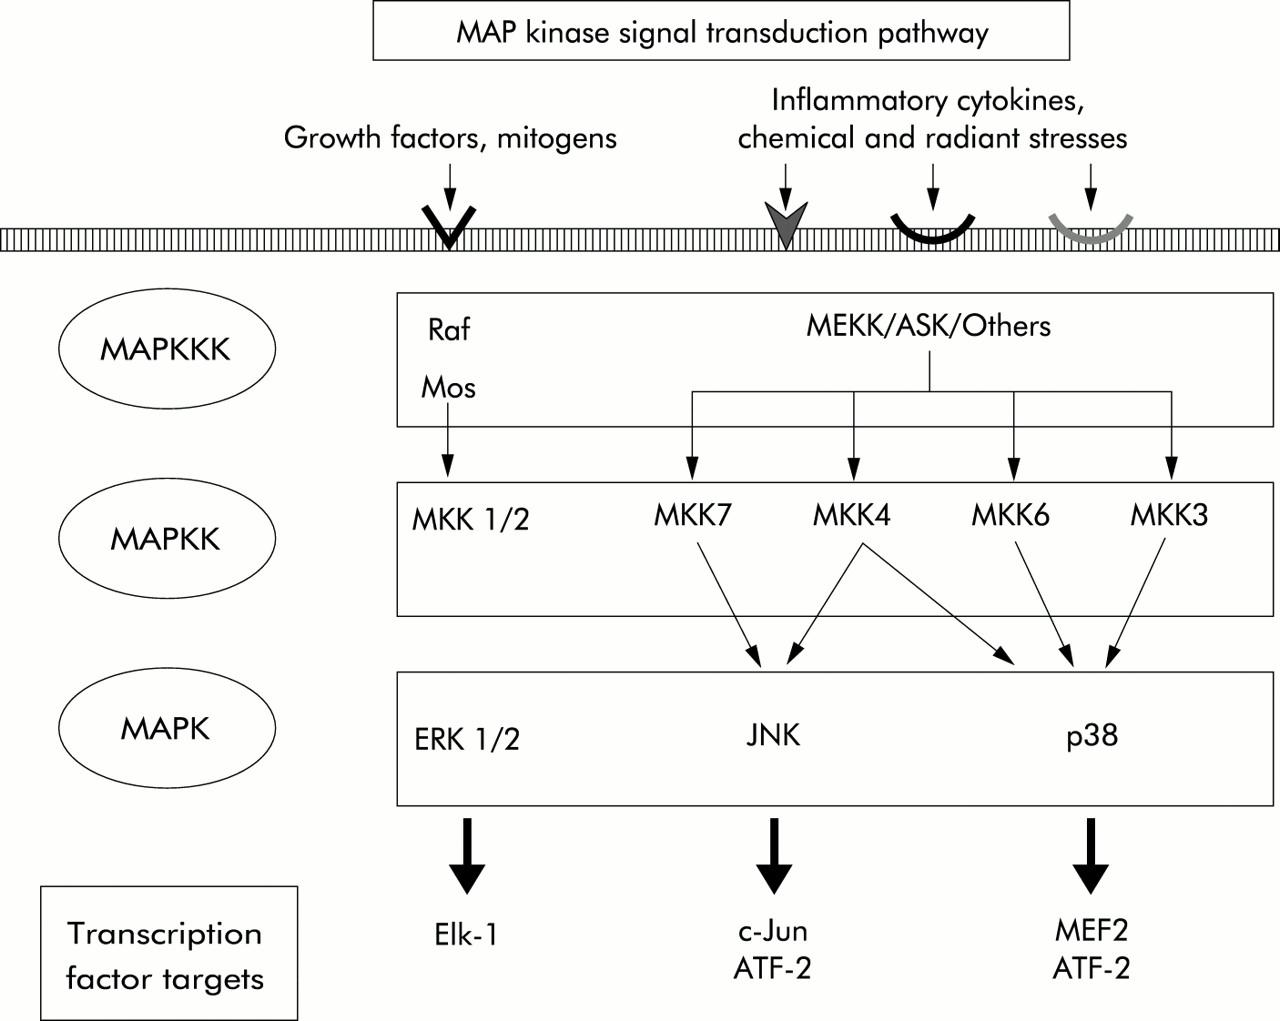 Min activated protein (MAP) kinase signal transduction ... on jak-stat signaling pathway, mapk/erk pathway, cyclic adenosine monophosphate, tgf beta signaling pathway, signal transduction, protein kinase, notch signaling pathway, receptor tyrosine kinase, wnt signaling pathway, cyclin-dependent kinase, pi3k/akt/mtor pathway, protein kinase c, adenylate cyclase, c-jun n-terminal kinases,